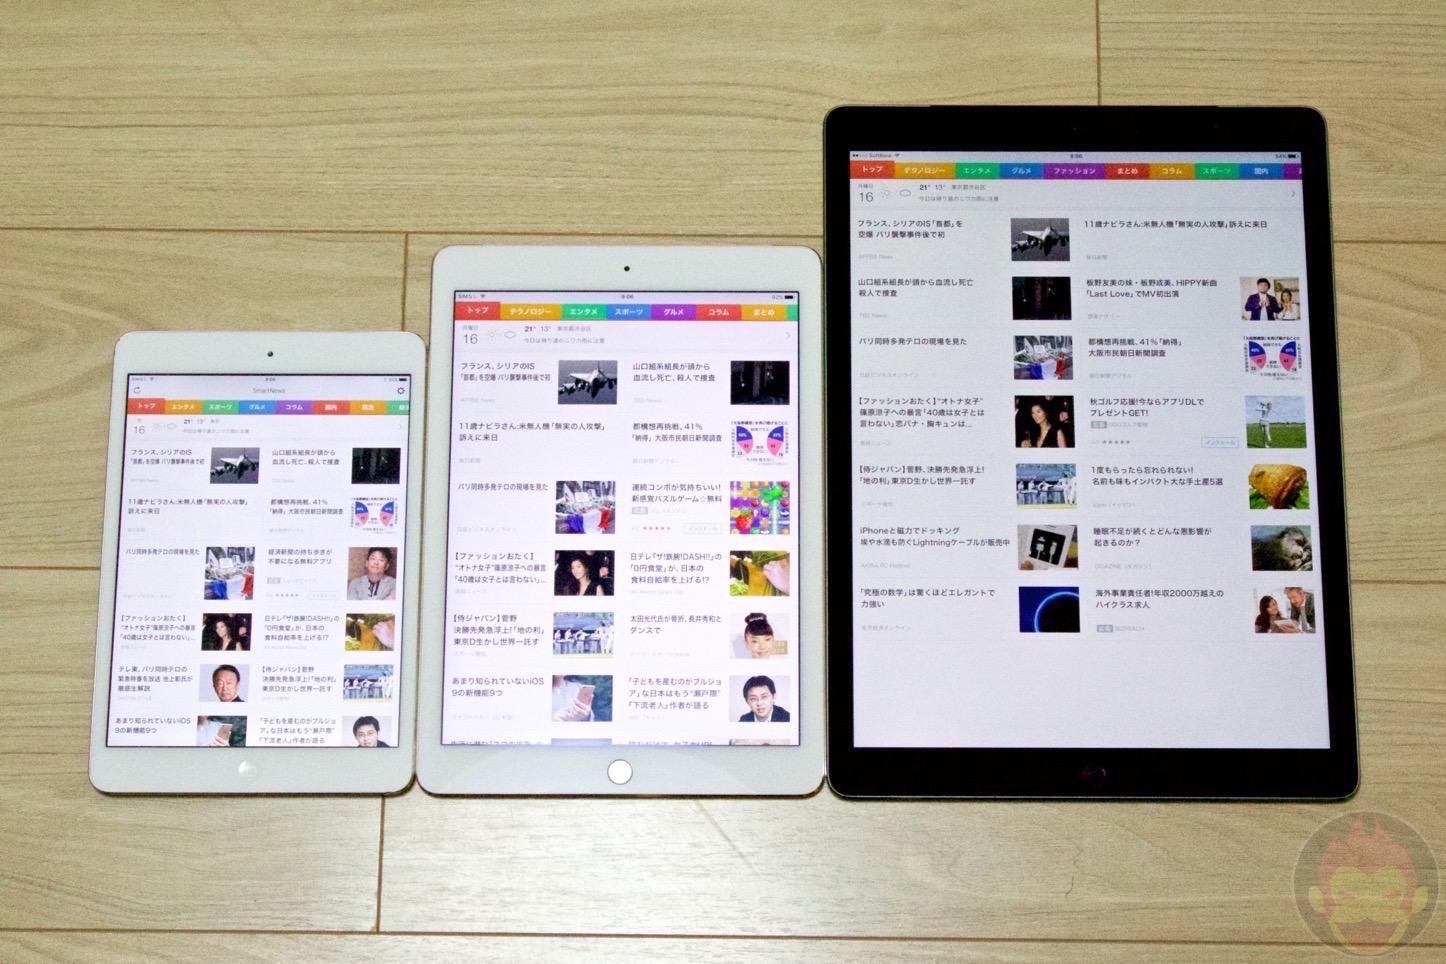 iPad-Pro-Air2-mini2-Comparison-06.jpg